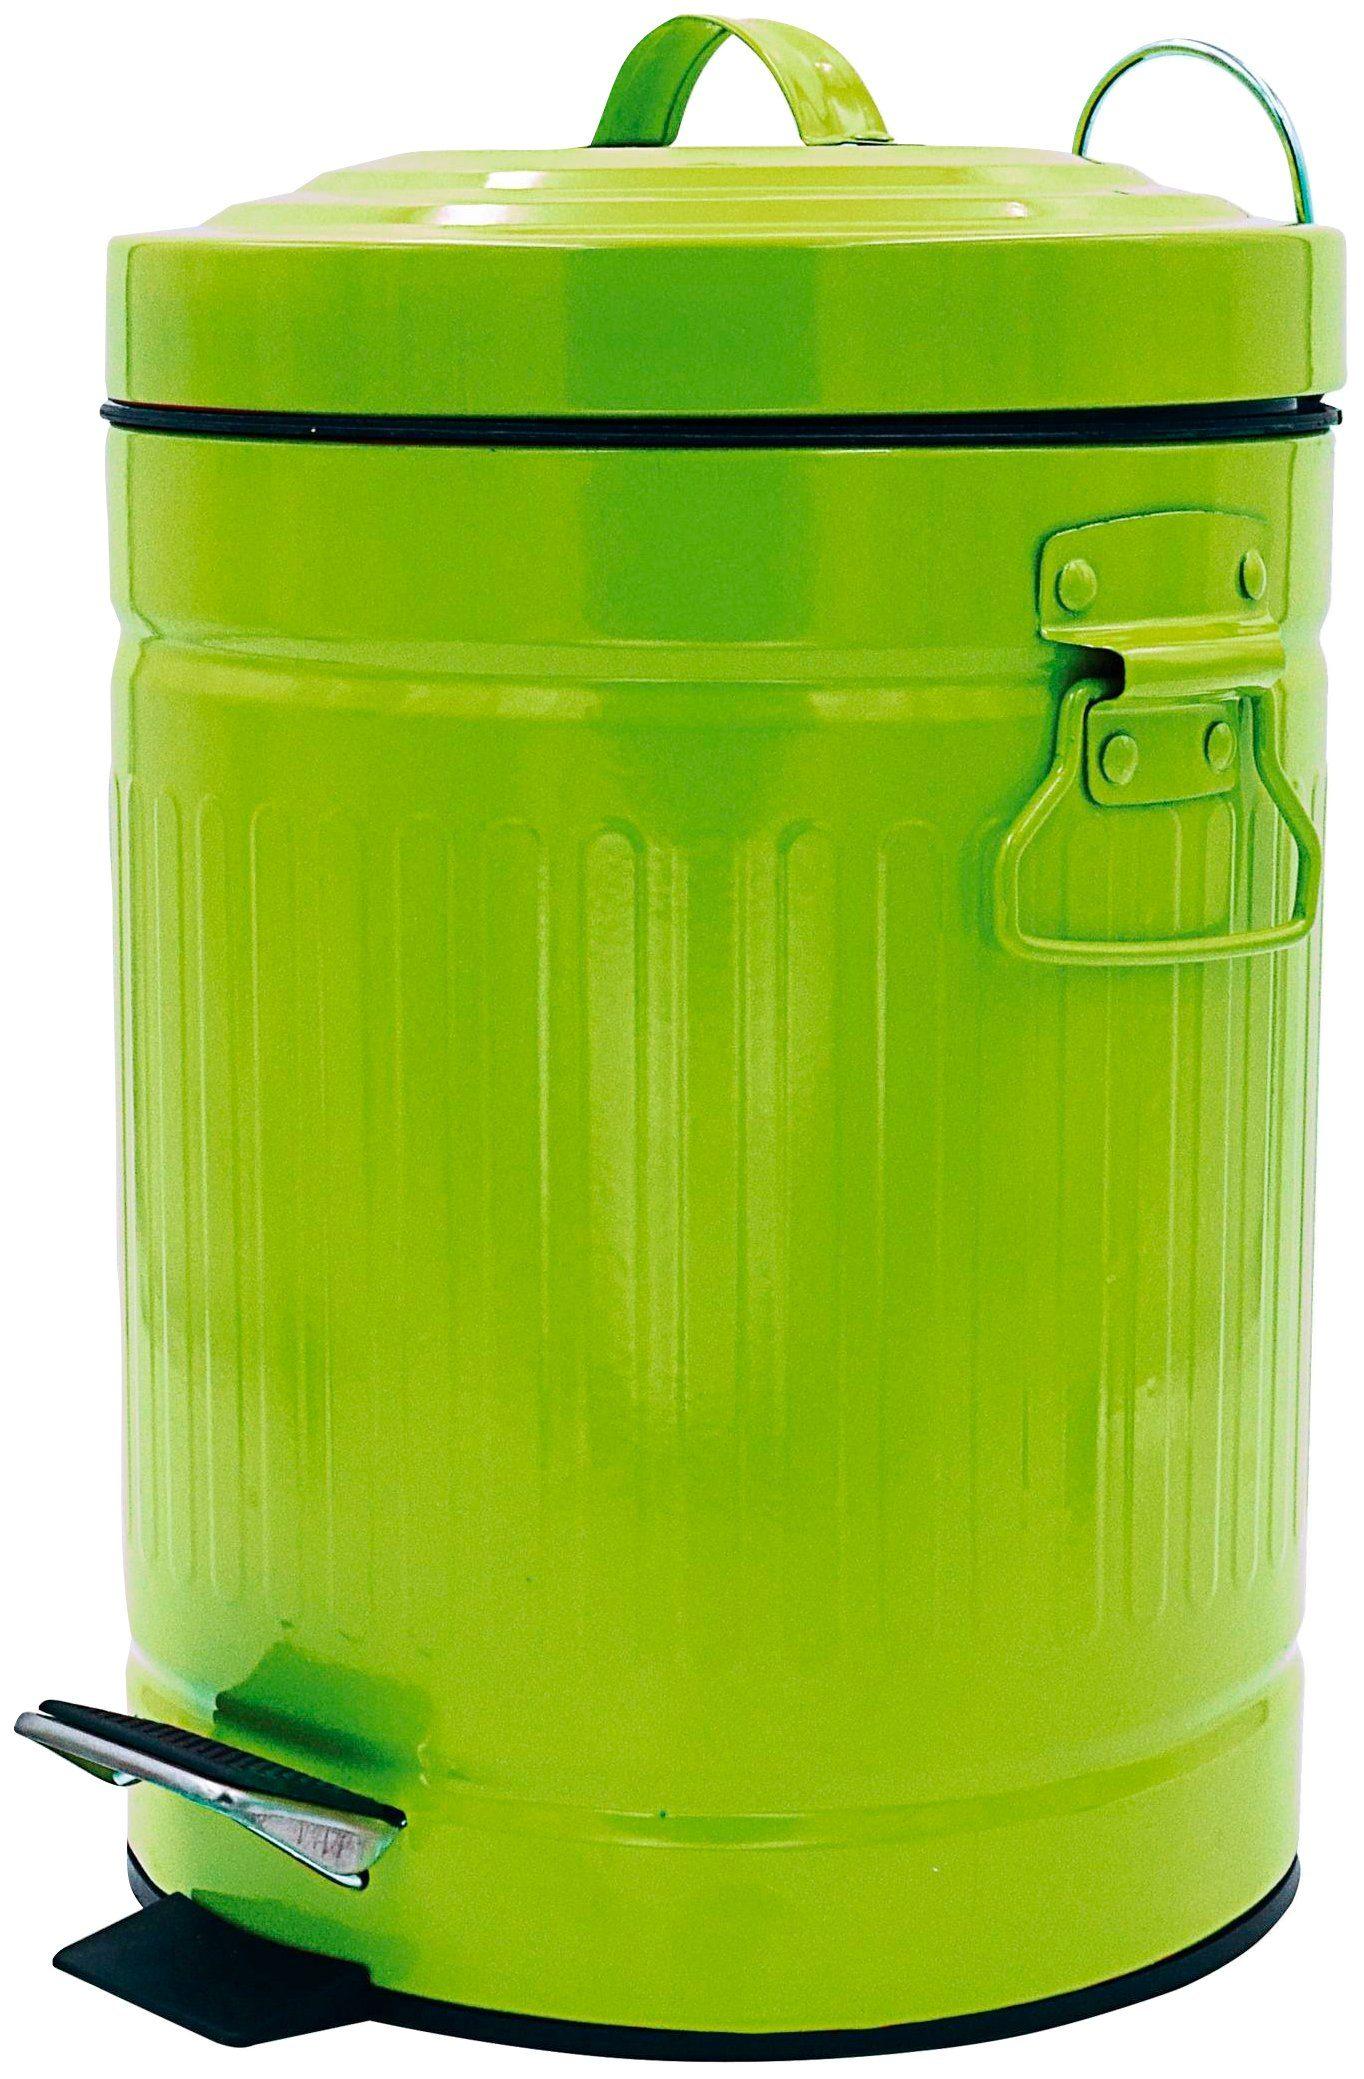 Element Neu Herren Grün Sonnenaufgang II Beanie Olive Farblos Neu mit Etikett